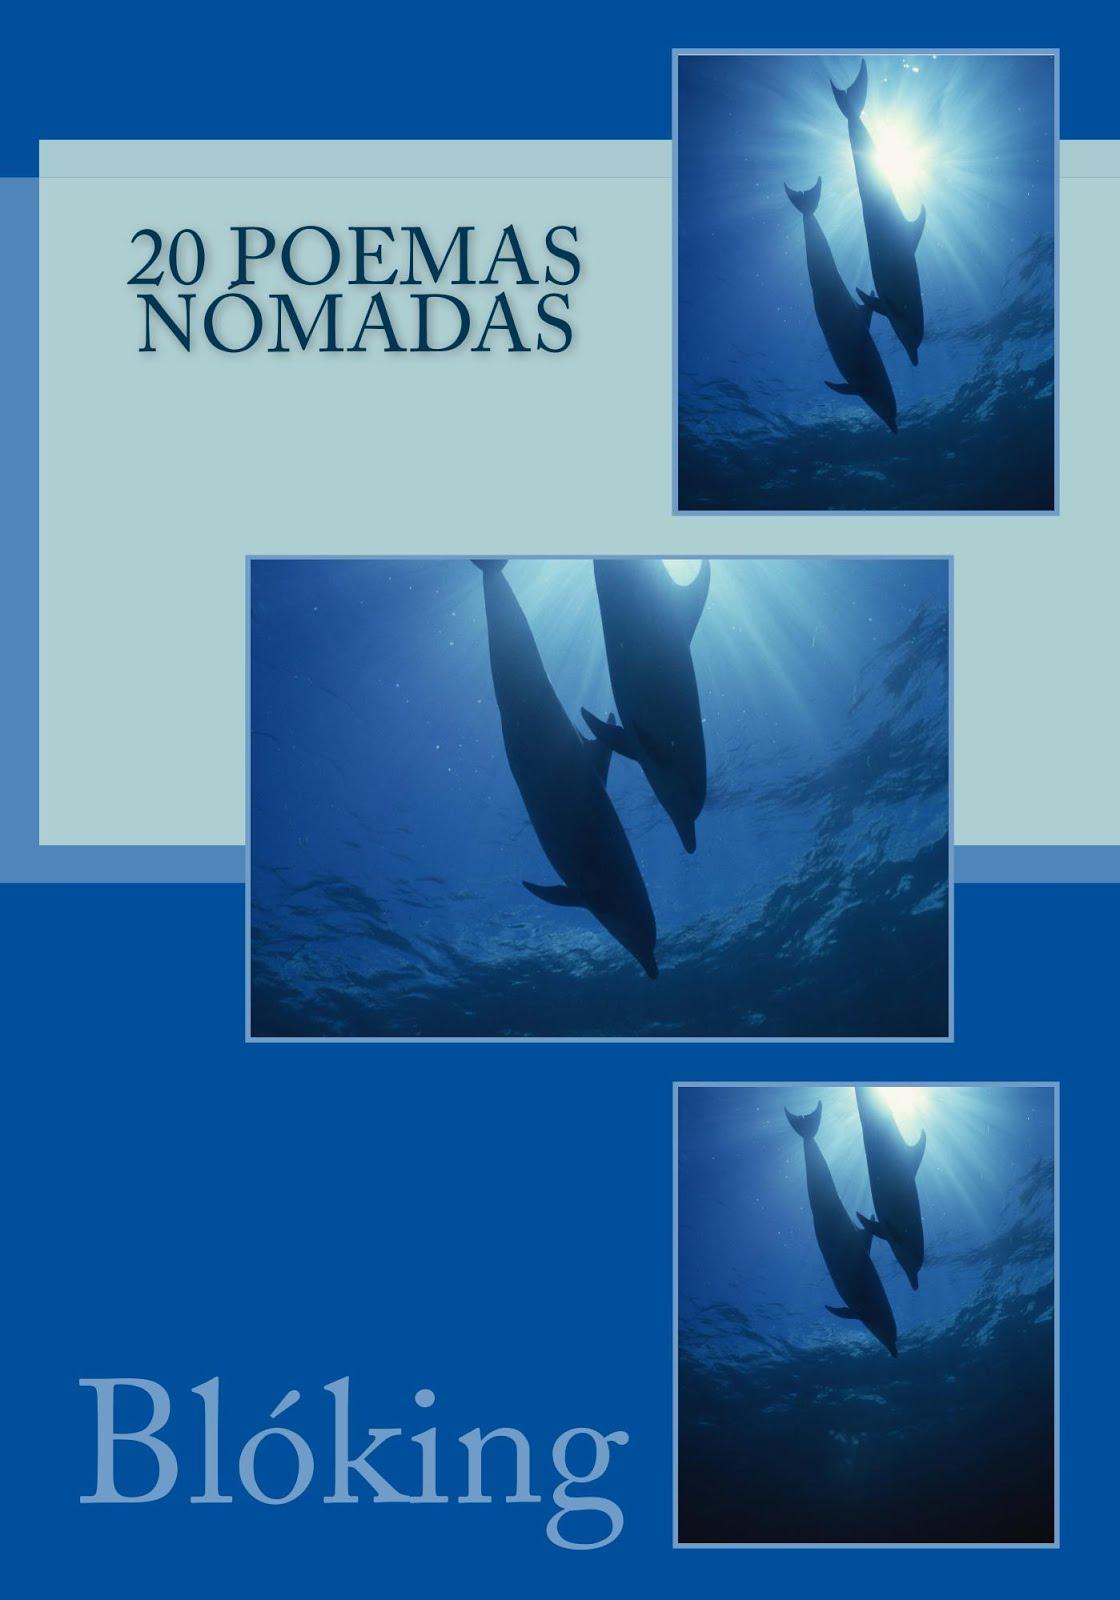 #Obra 9 - 20 Poemas nómadas